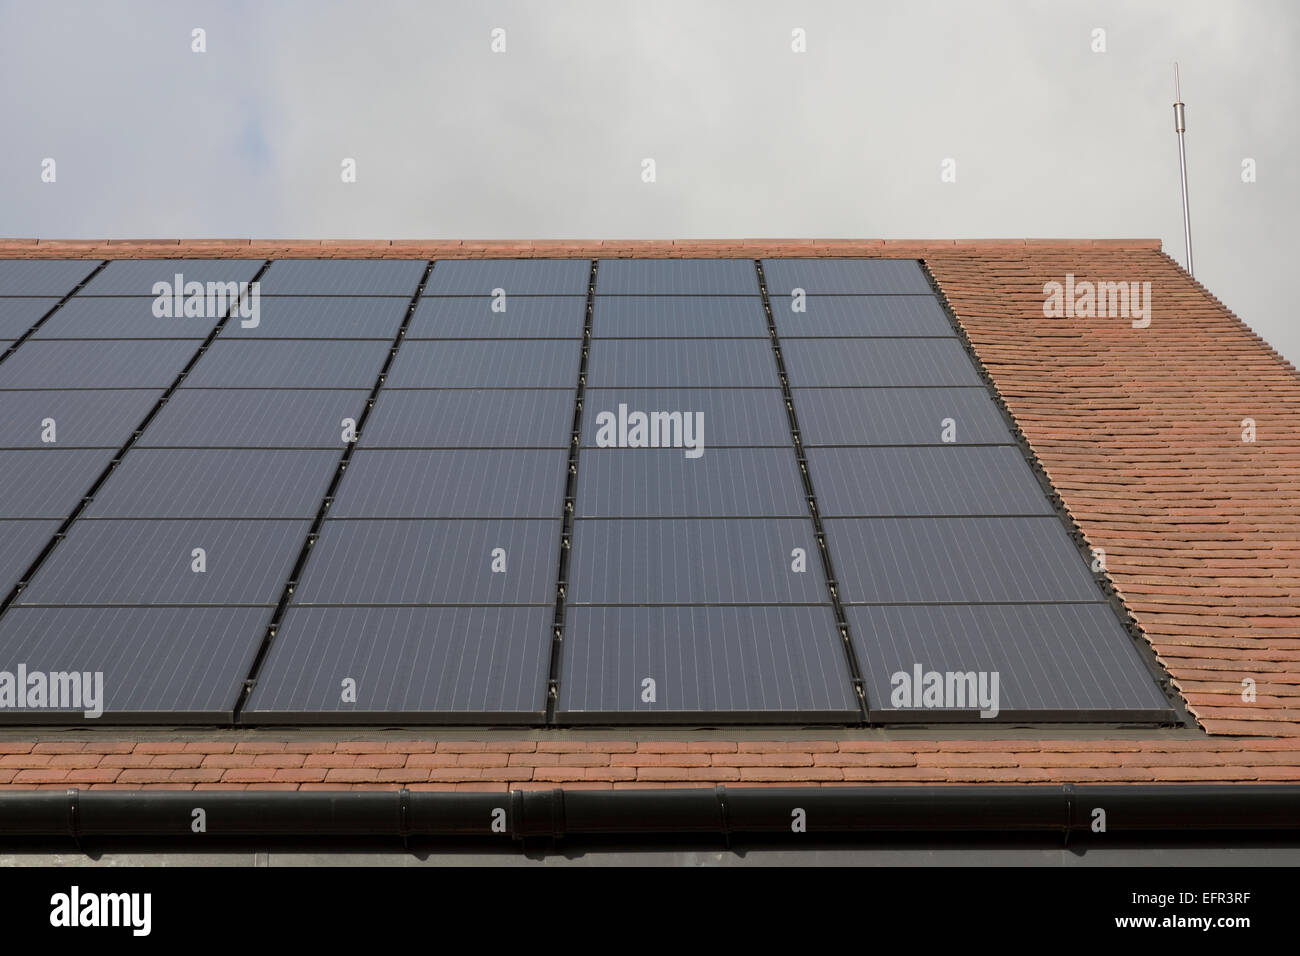 Thin Film Solar Pv Panels On Roof Community Centre Zero